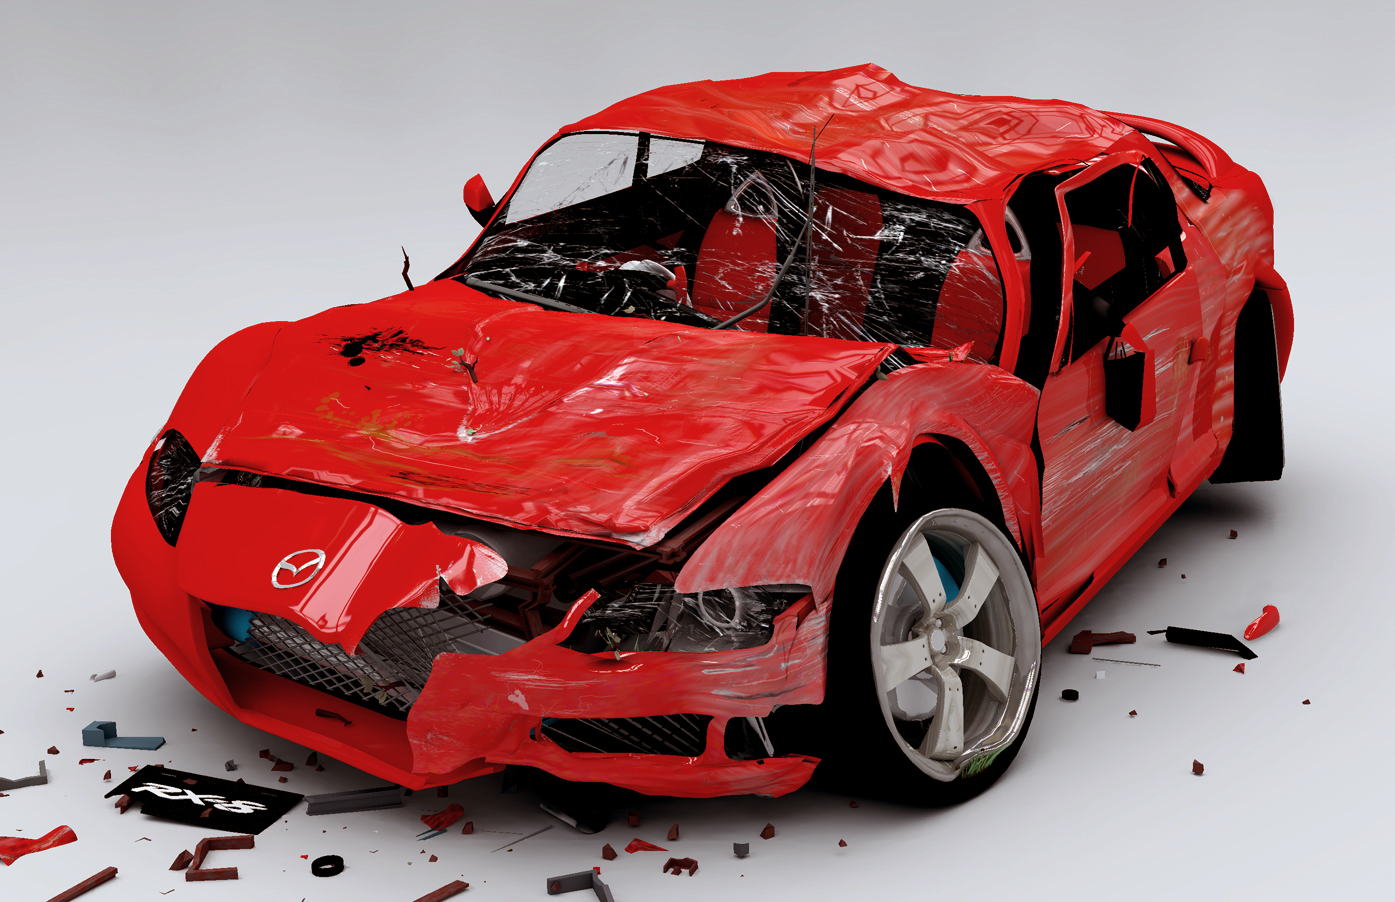 Mazda Rx8 Problems and Complaints – Paul Kerrison